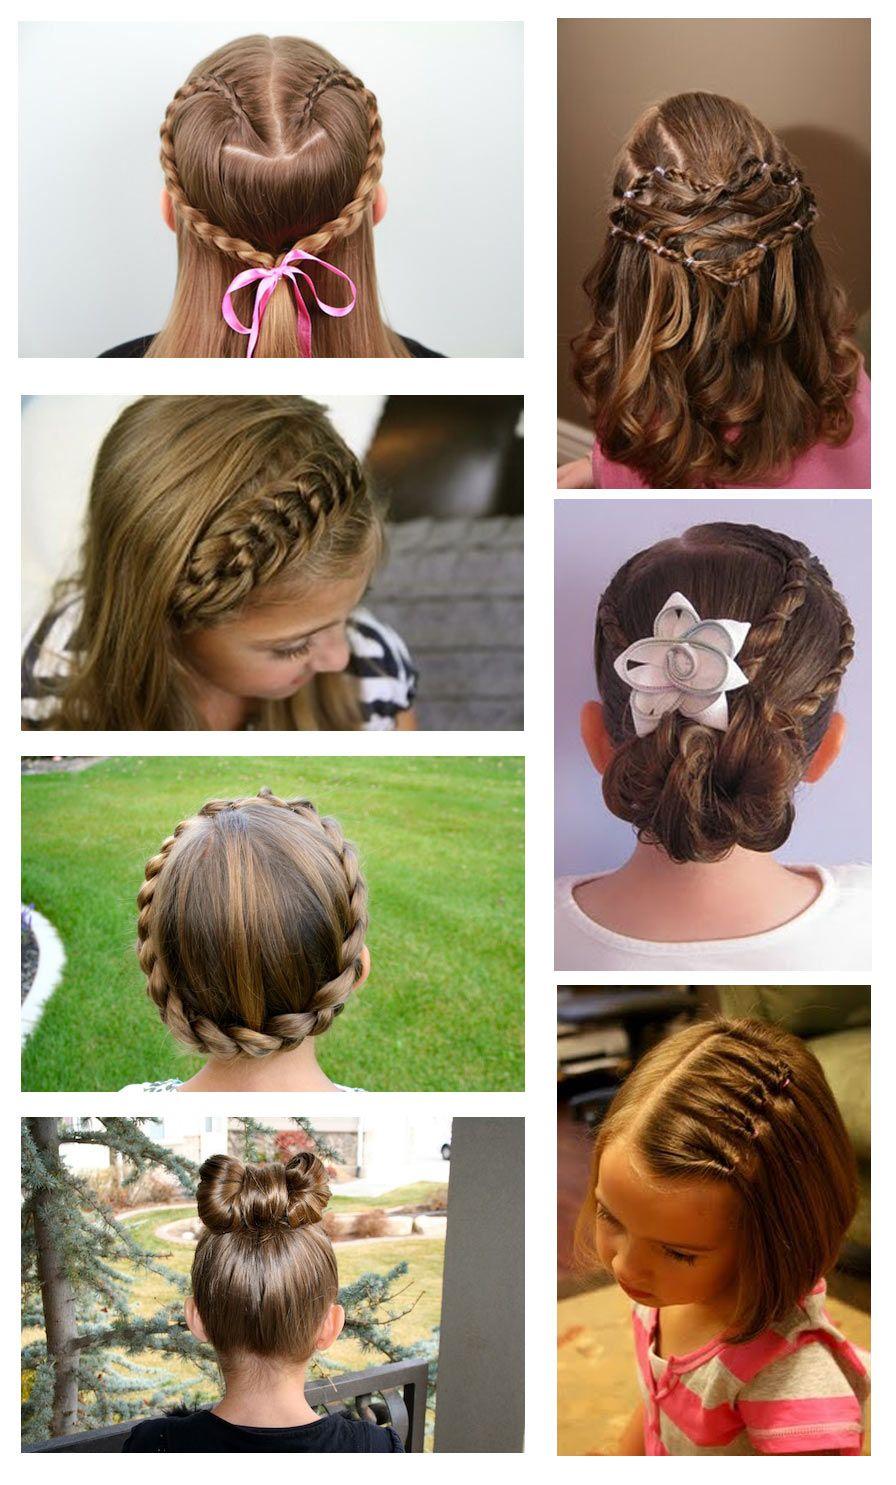 15++ Petite fille coiffure des idees